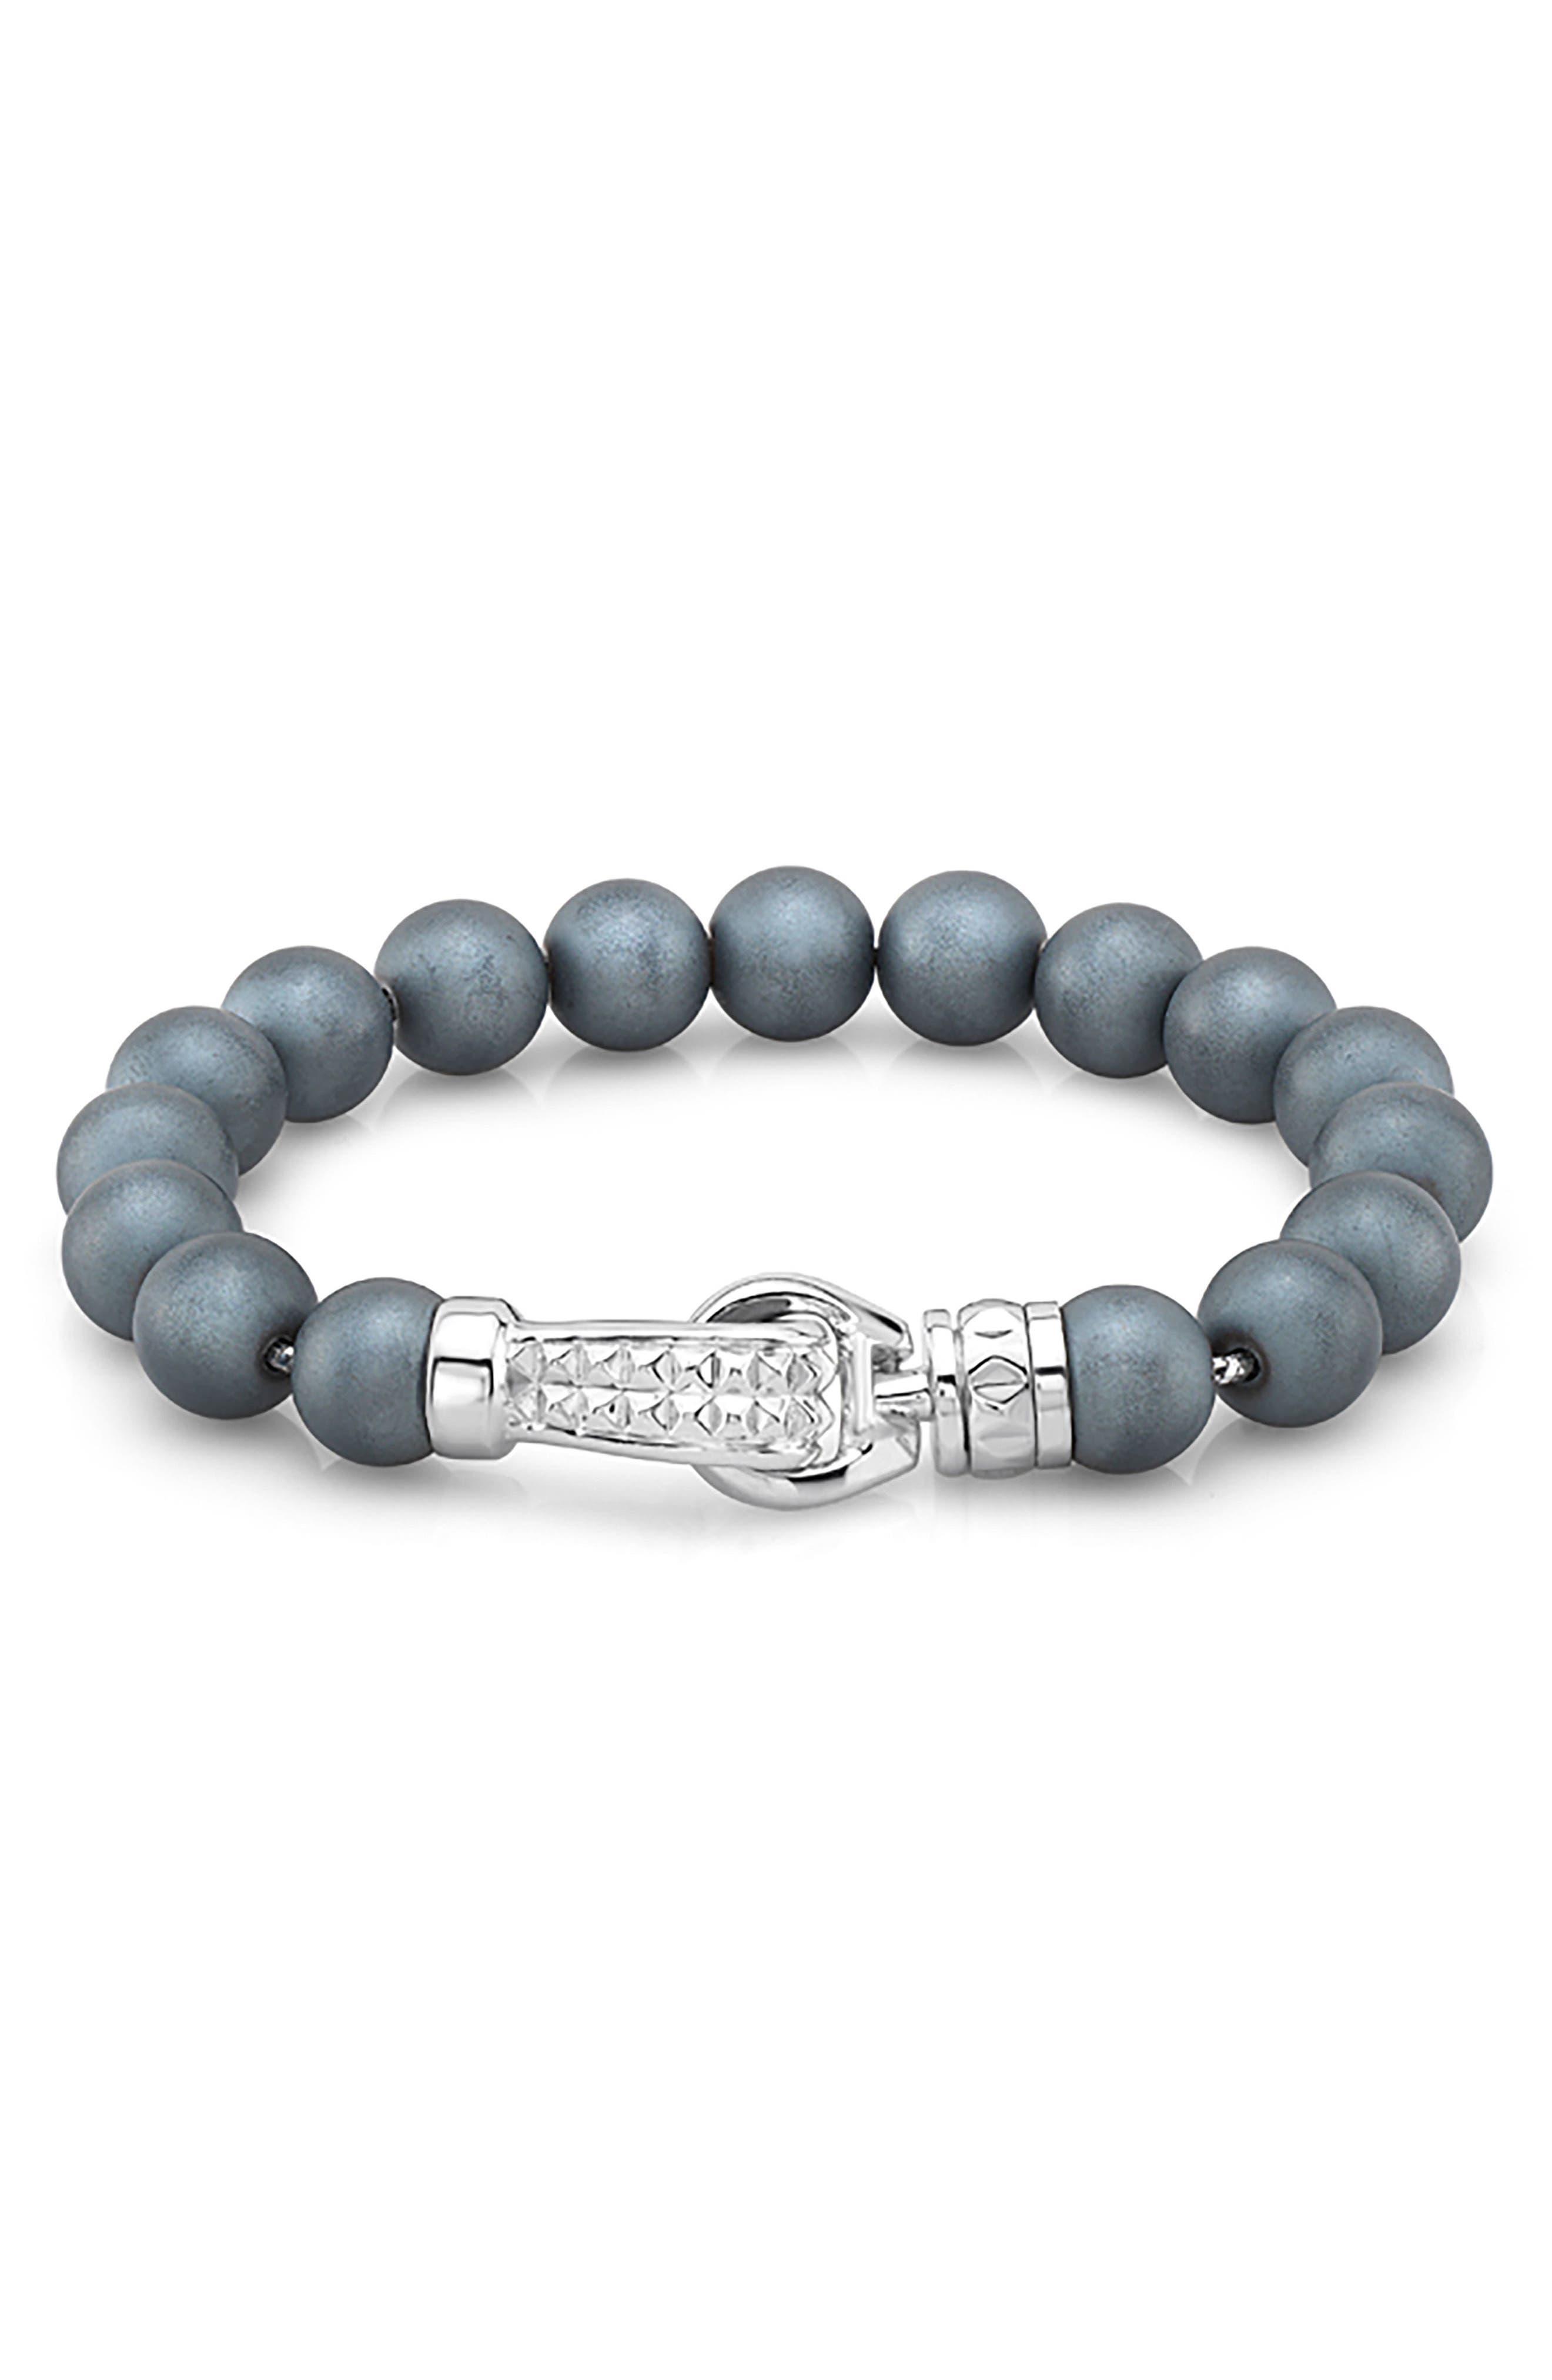 Hematite Bead Bracelet,                         Main,                         color, SILVER